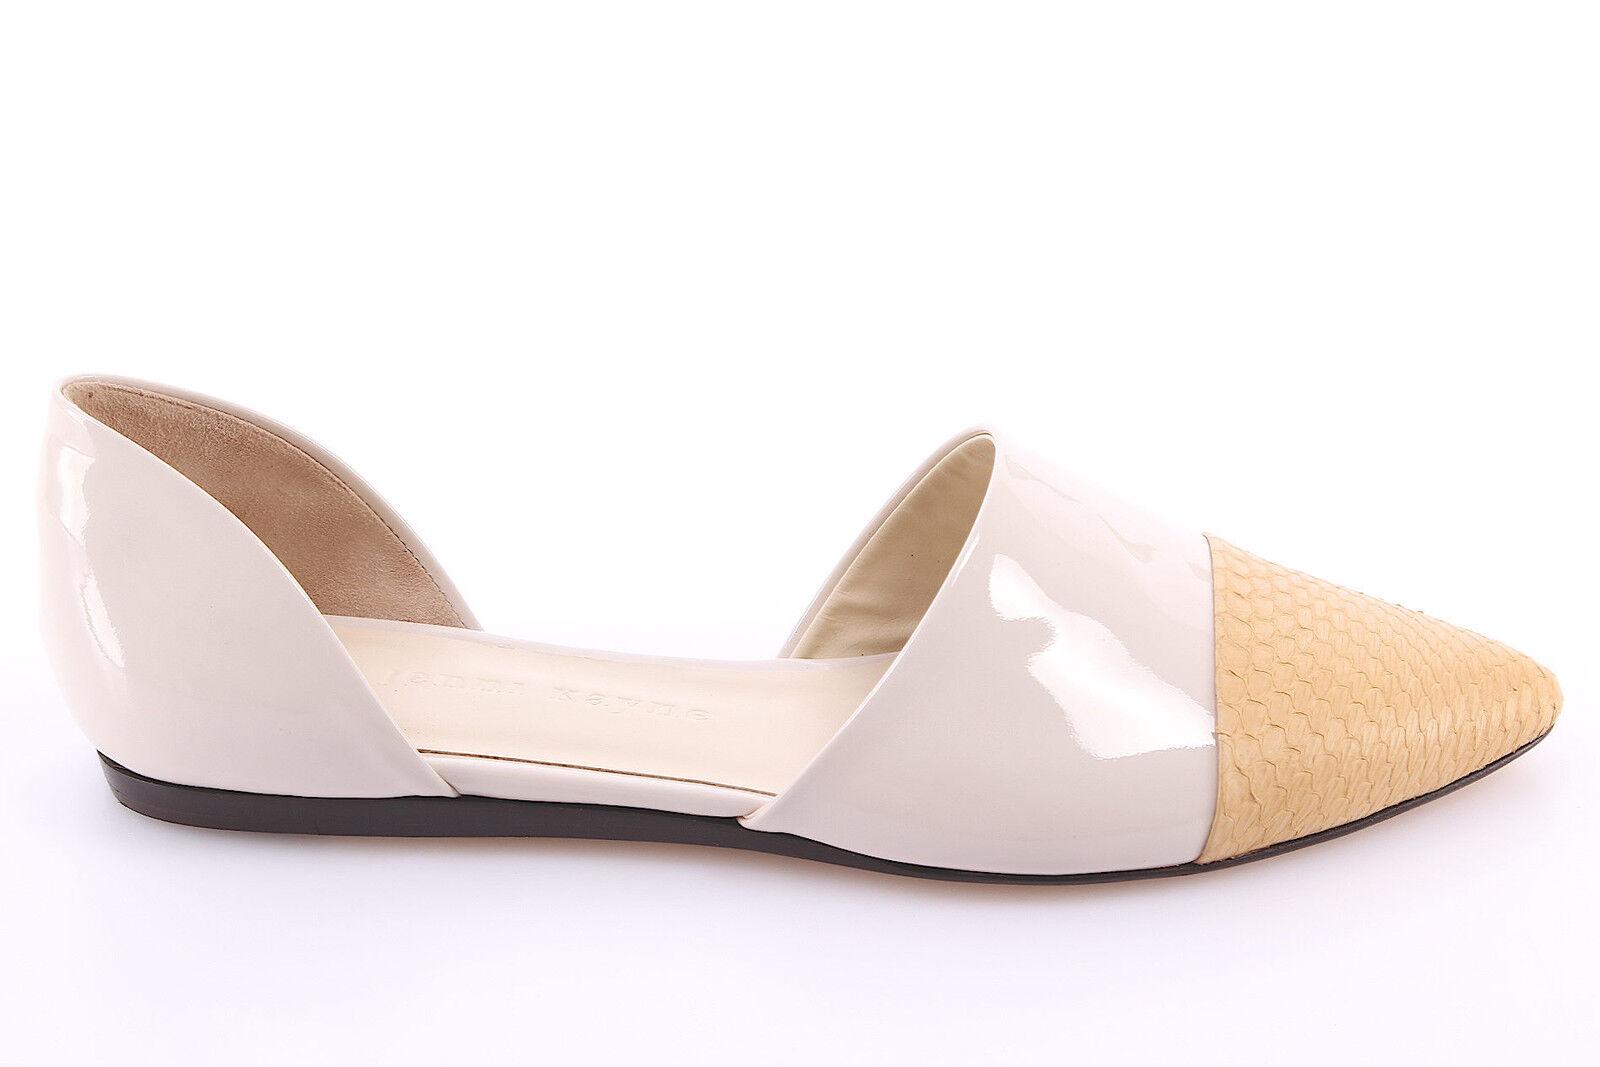 Damen Schuhe Ballerinas Ballerinas Schuhe Sandalen JENNI KAYNE Leder Glossy Weiß Real Snake Neue a5e787